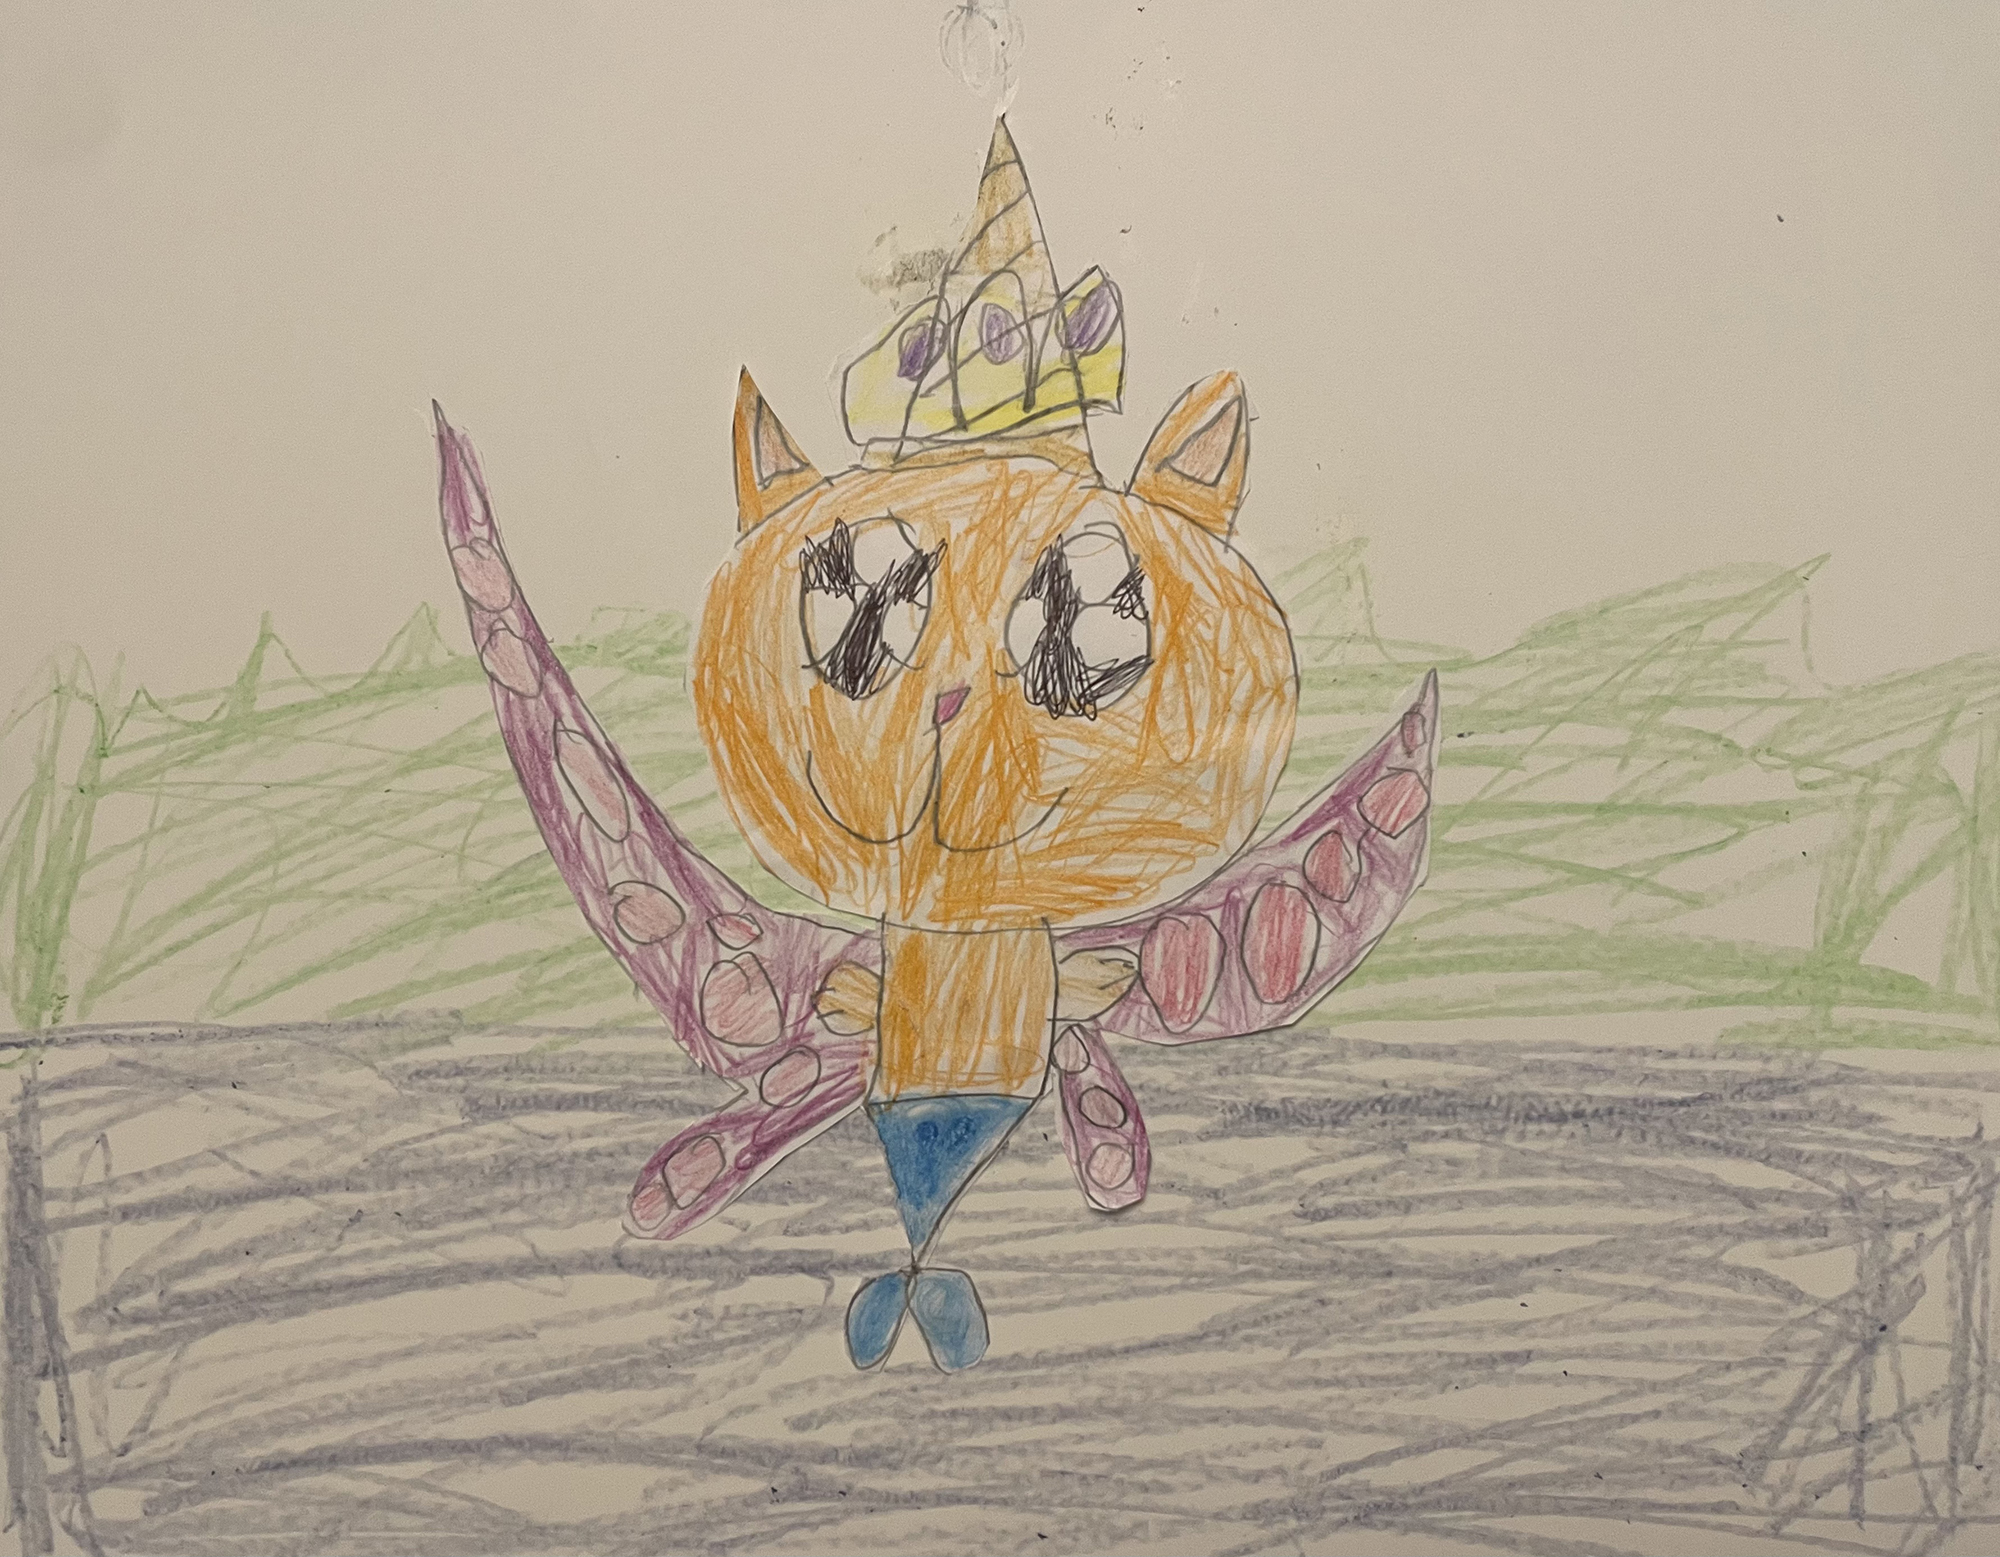 1st. Kaeli Paradise, Princess Maya, the flying Mermi-cat-icorn